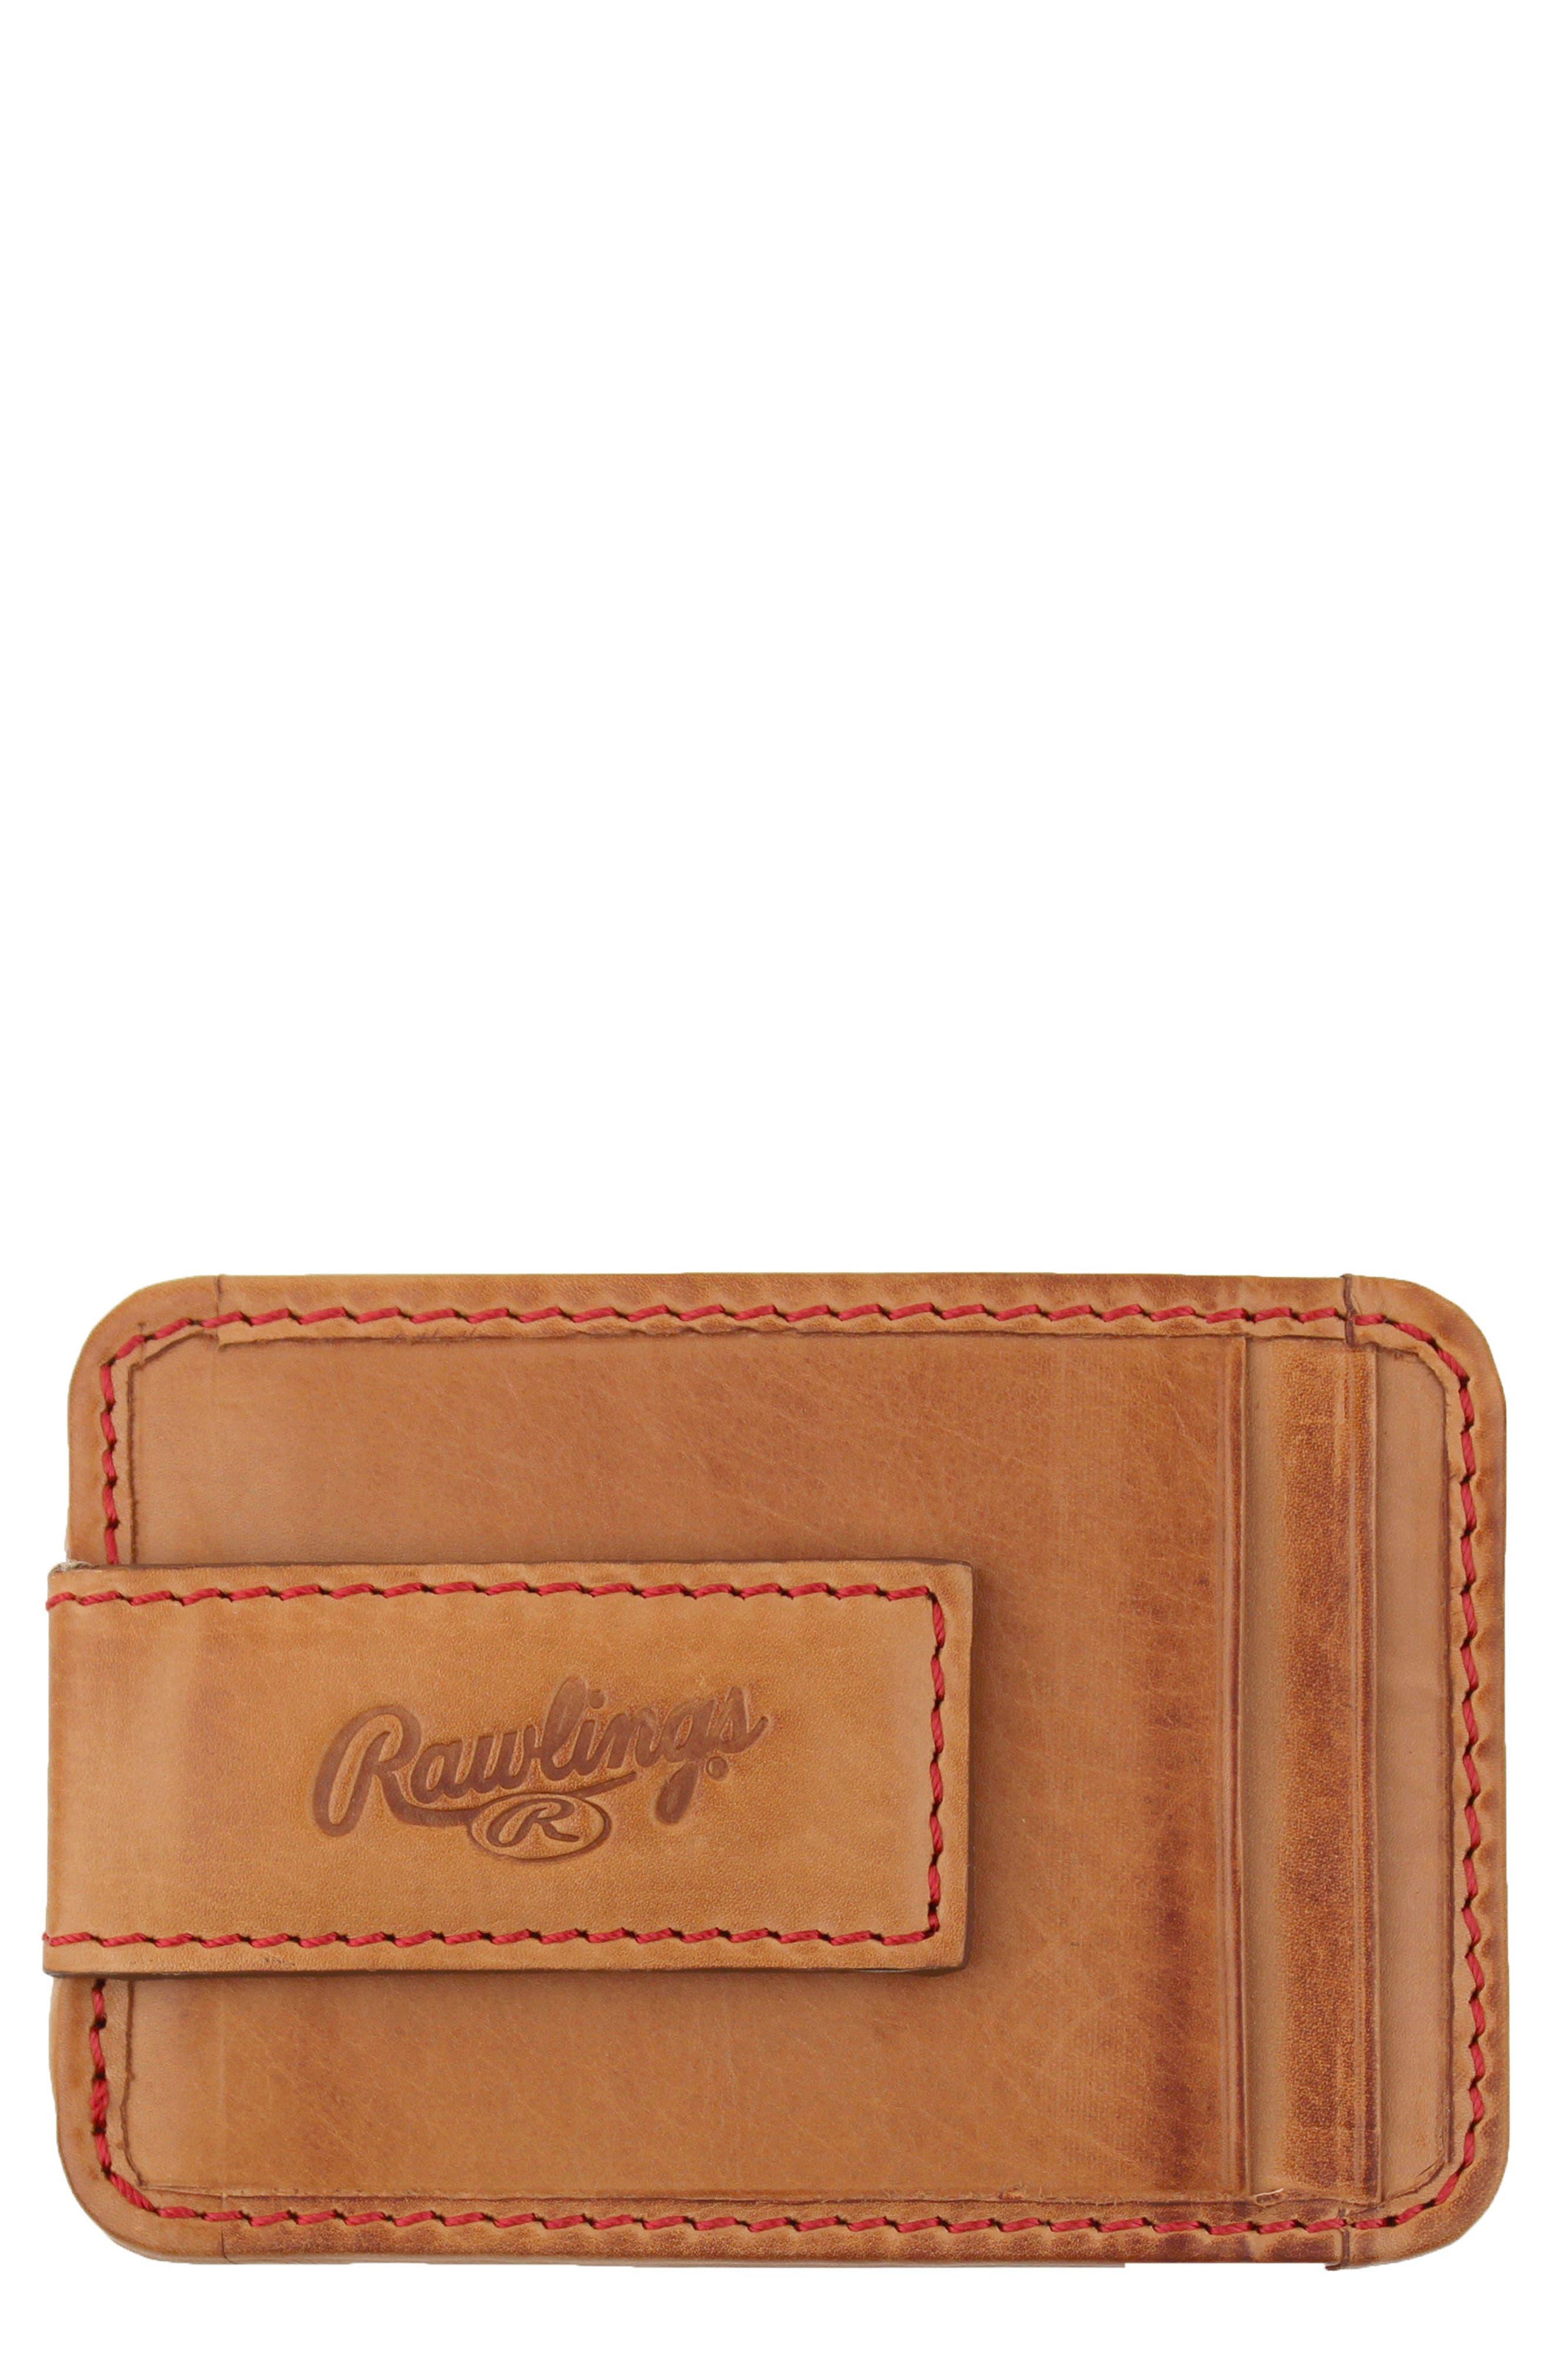 Baseball Stitch Money Clip Card Case,                             Main thumbnail 1, color,                             Tan